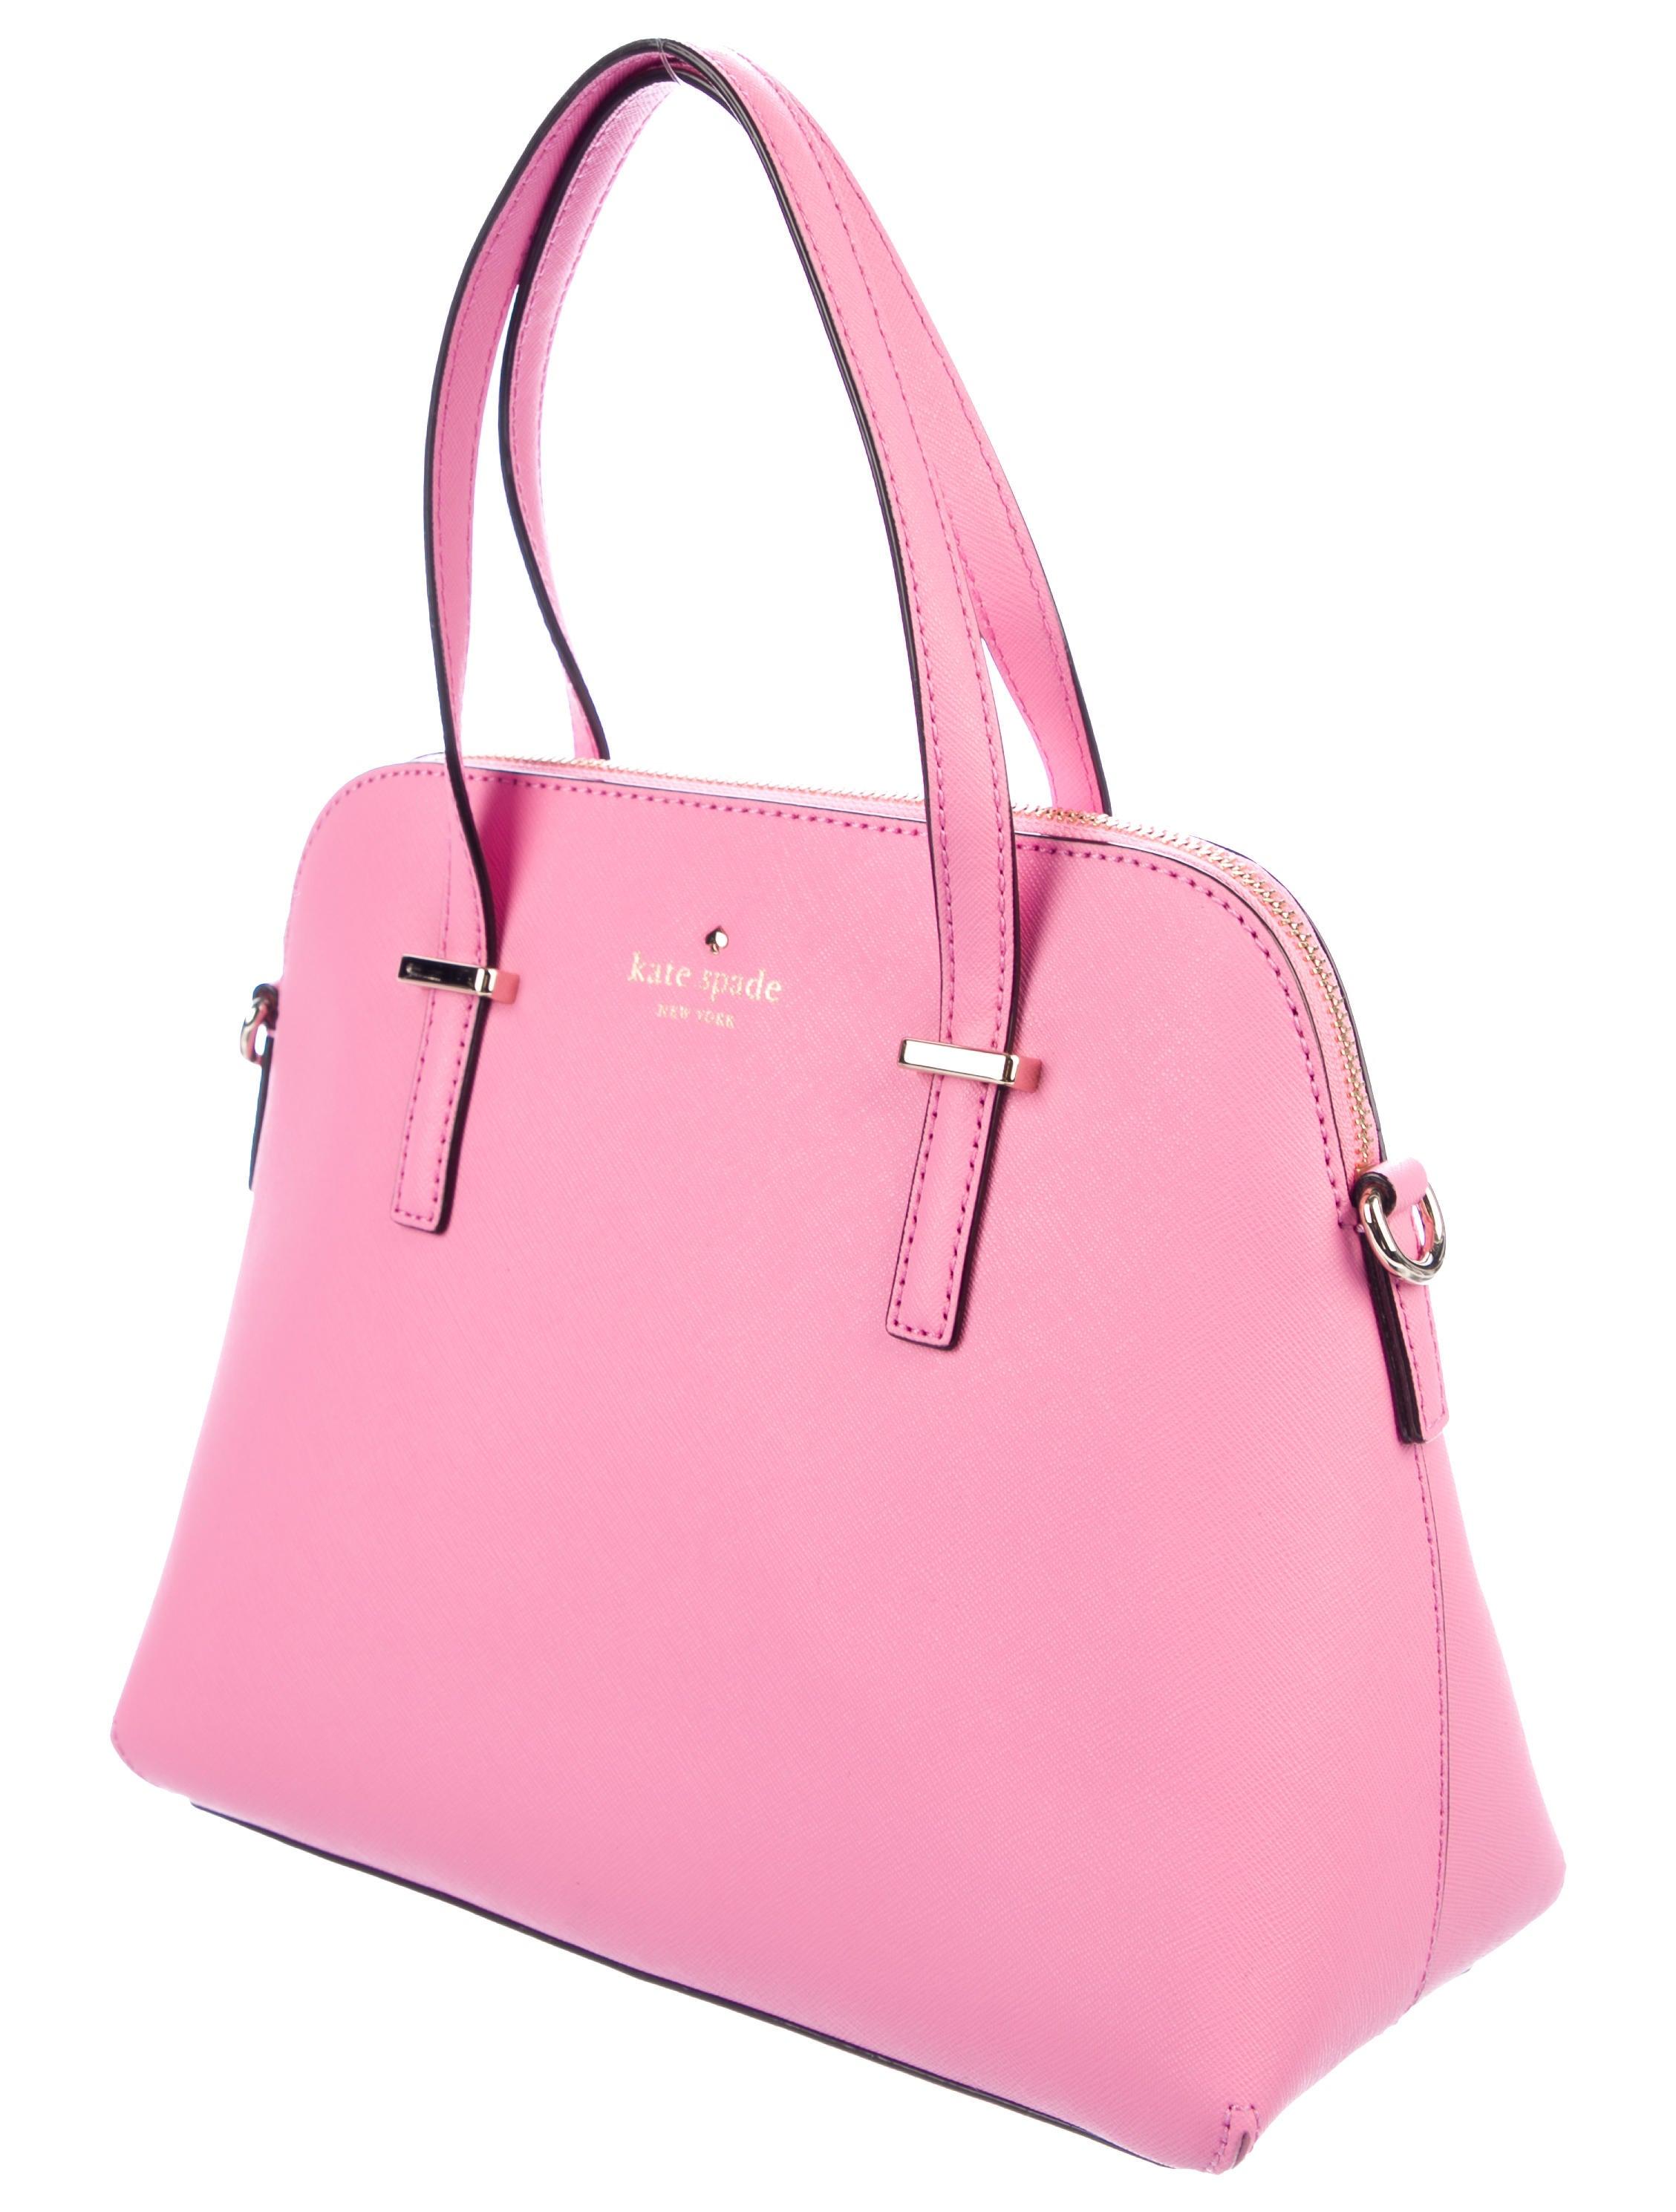 Kate Spade New York Cedar Street Maise Satchel Handbags Wka88643 Katespade